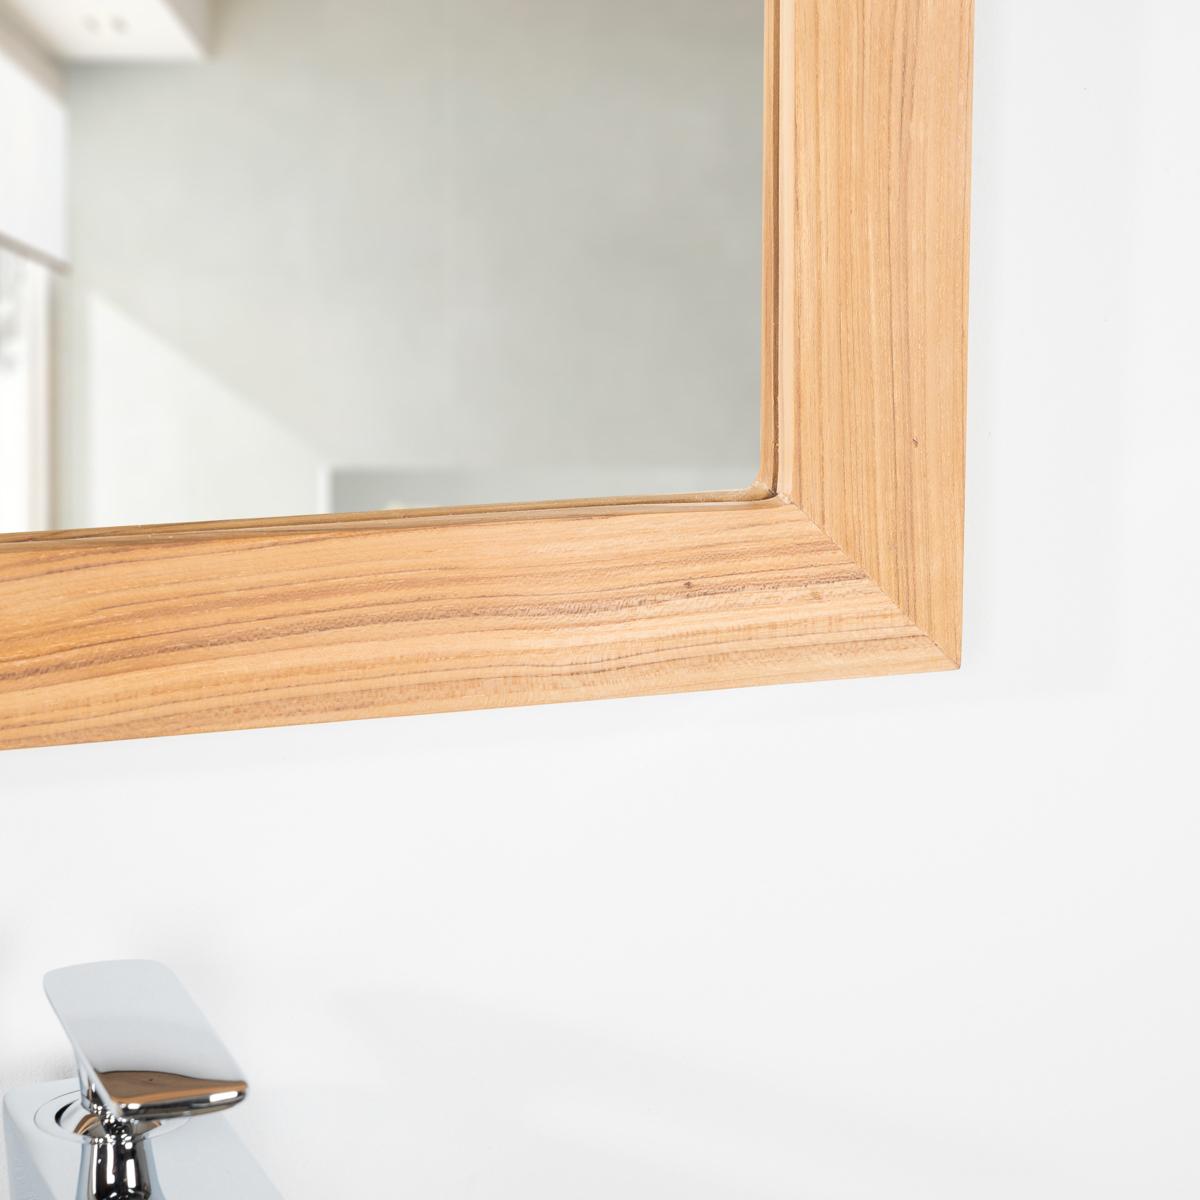 Neuf miroir rectangle en teck massif 70x50 ebay for Miroir teck 50 x 70